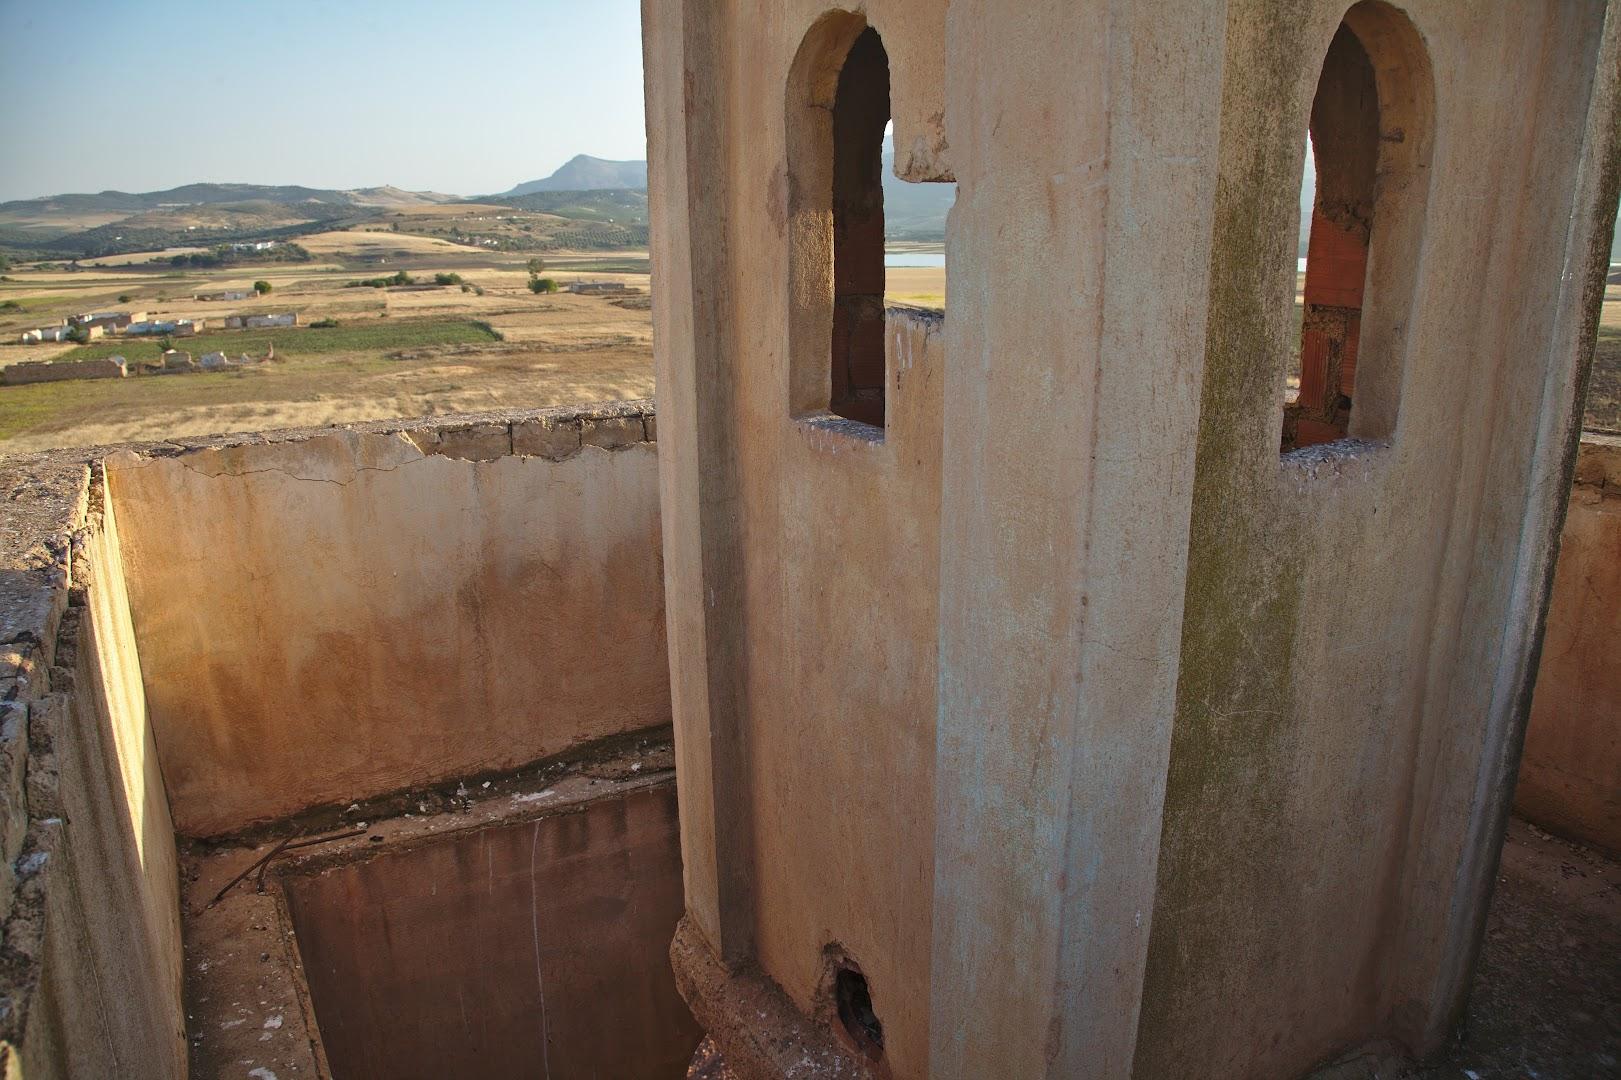 I always wanted to climb a minaret